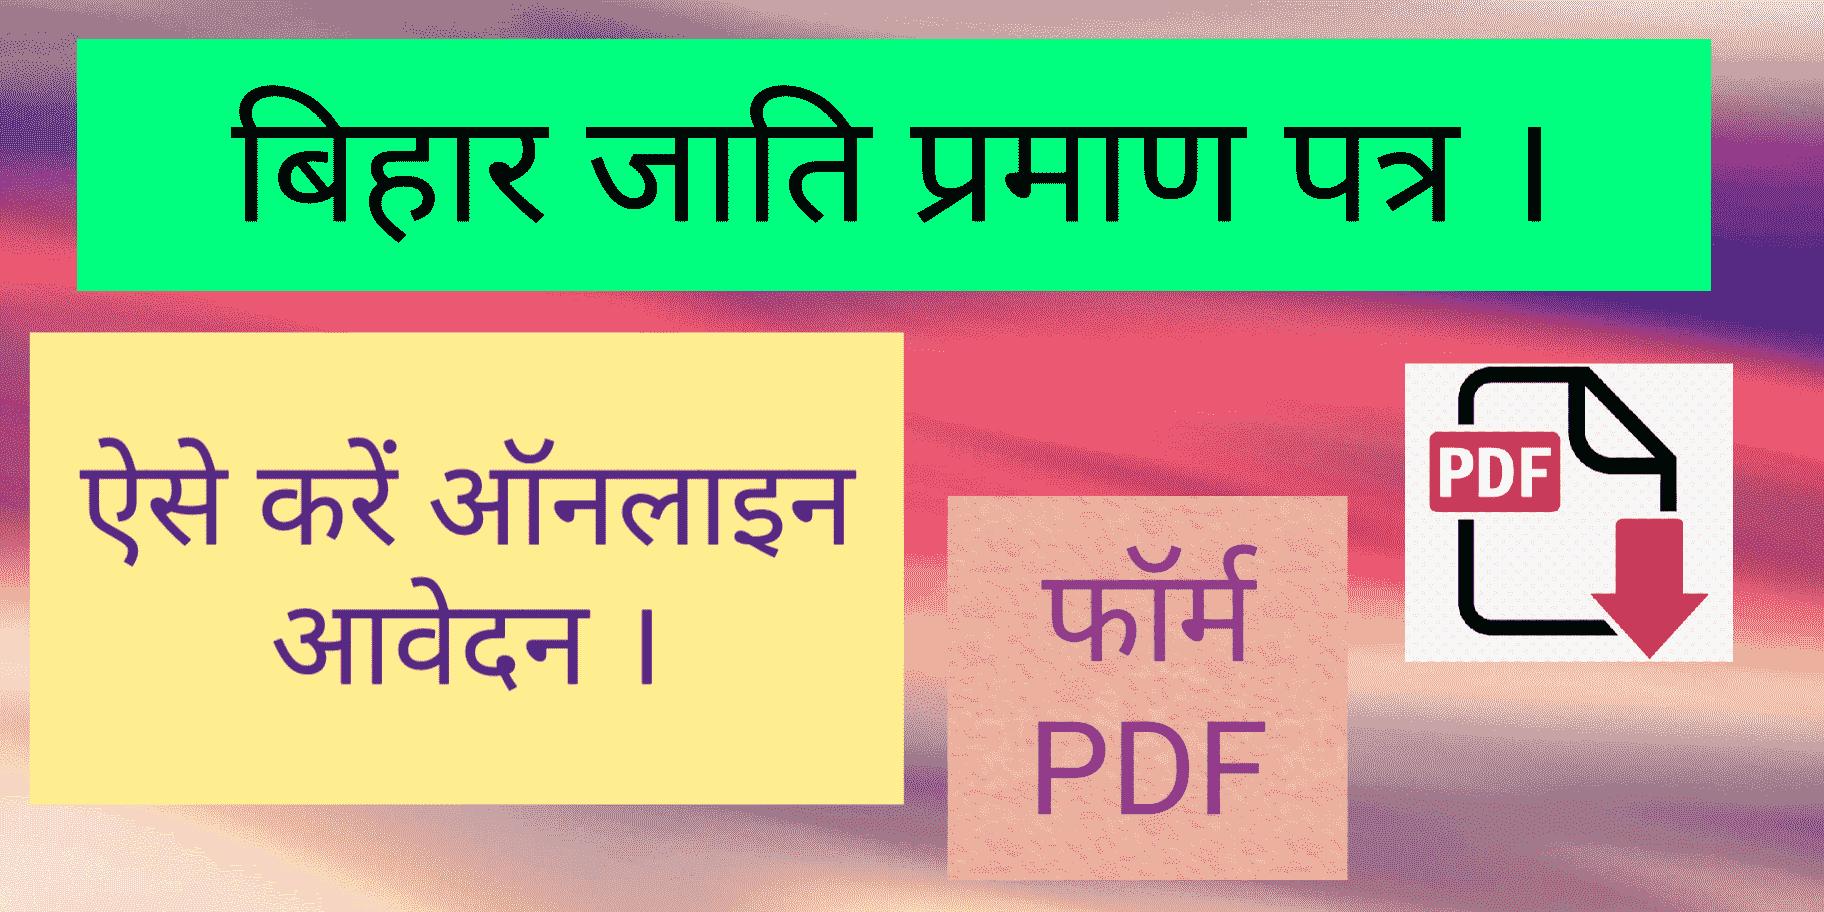 [PDF] बिहार जाति प्रमाण पत्र आवेदन , Jati Praman Patra Form (2020)